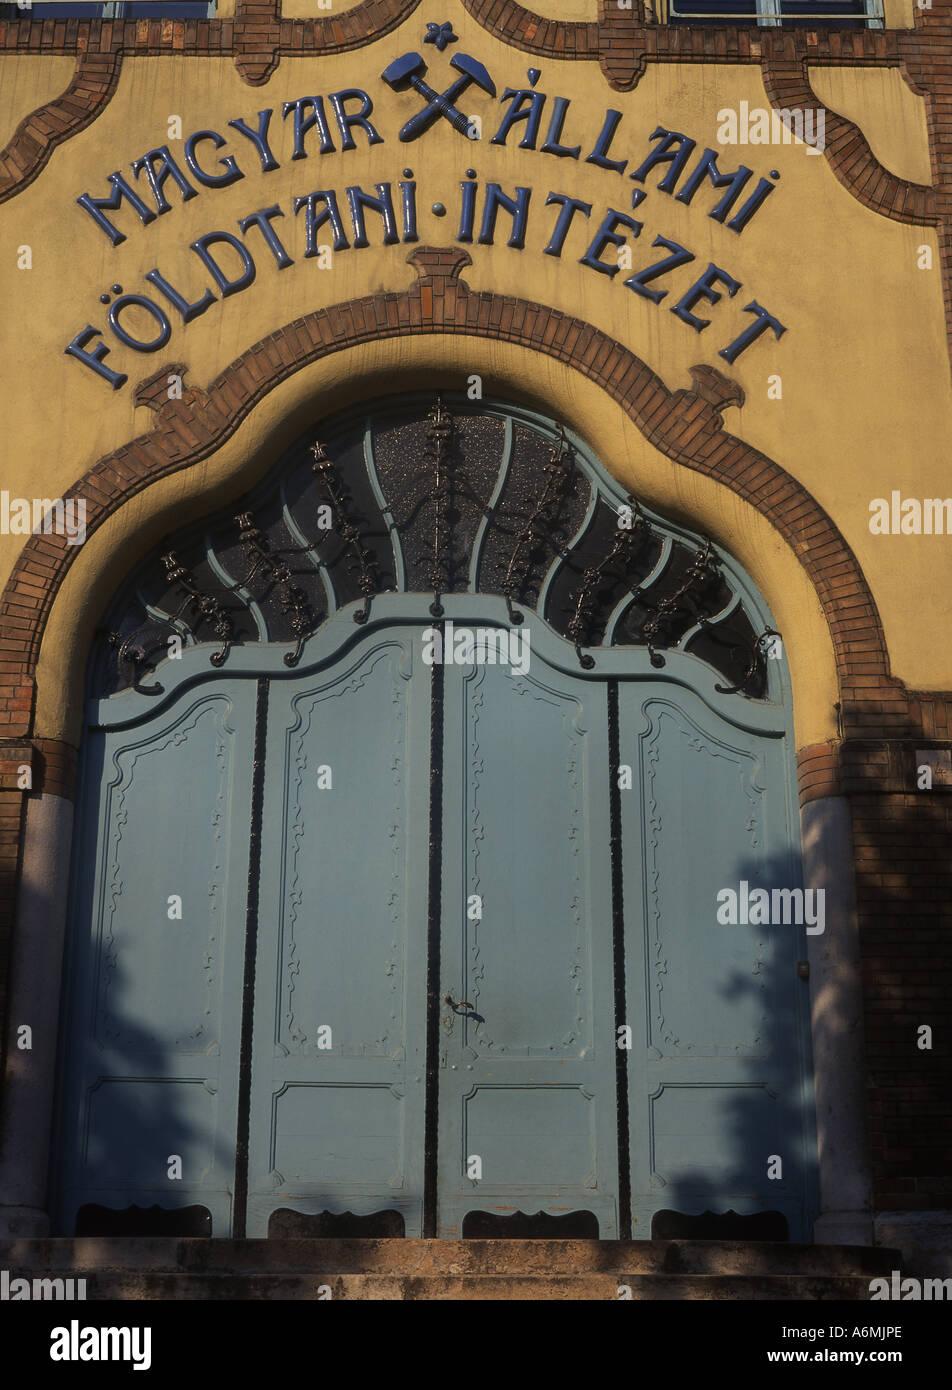 Hungarian National Geological Institute Magyar Allami Foldtani Intezet Art Nouveau building by Odon Lechner Budapest Hungary - Stock Image